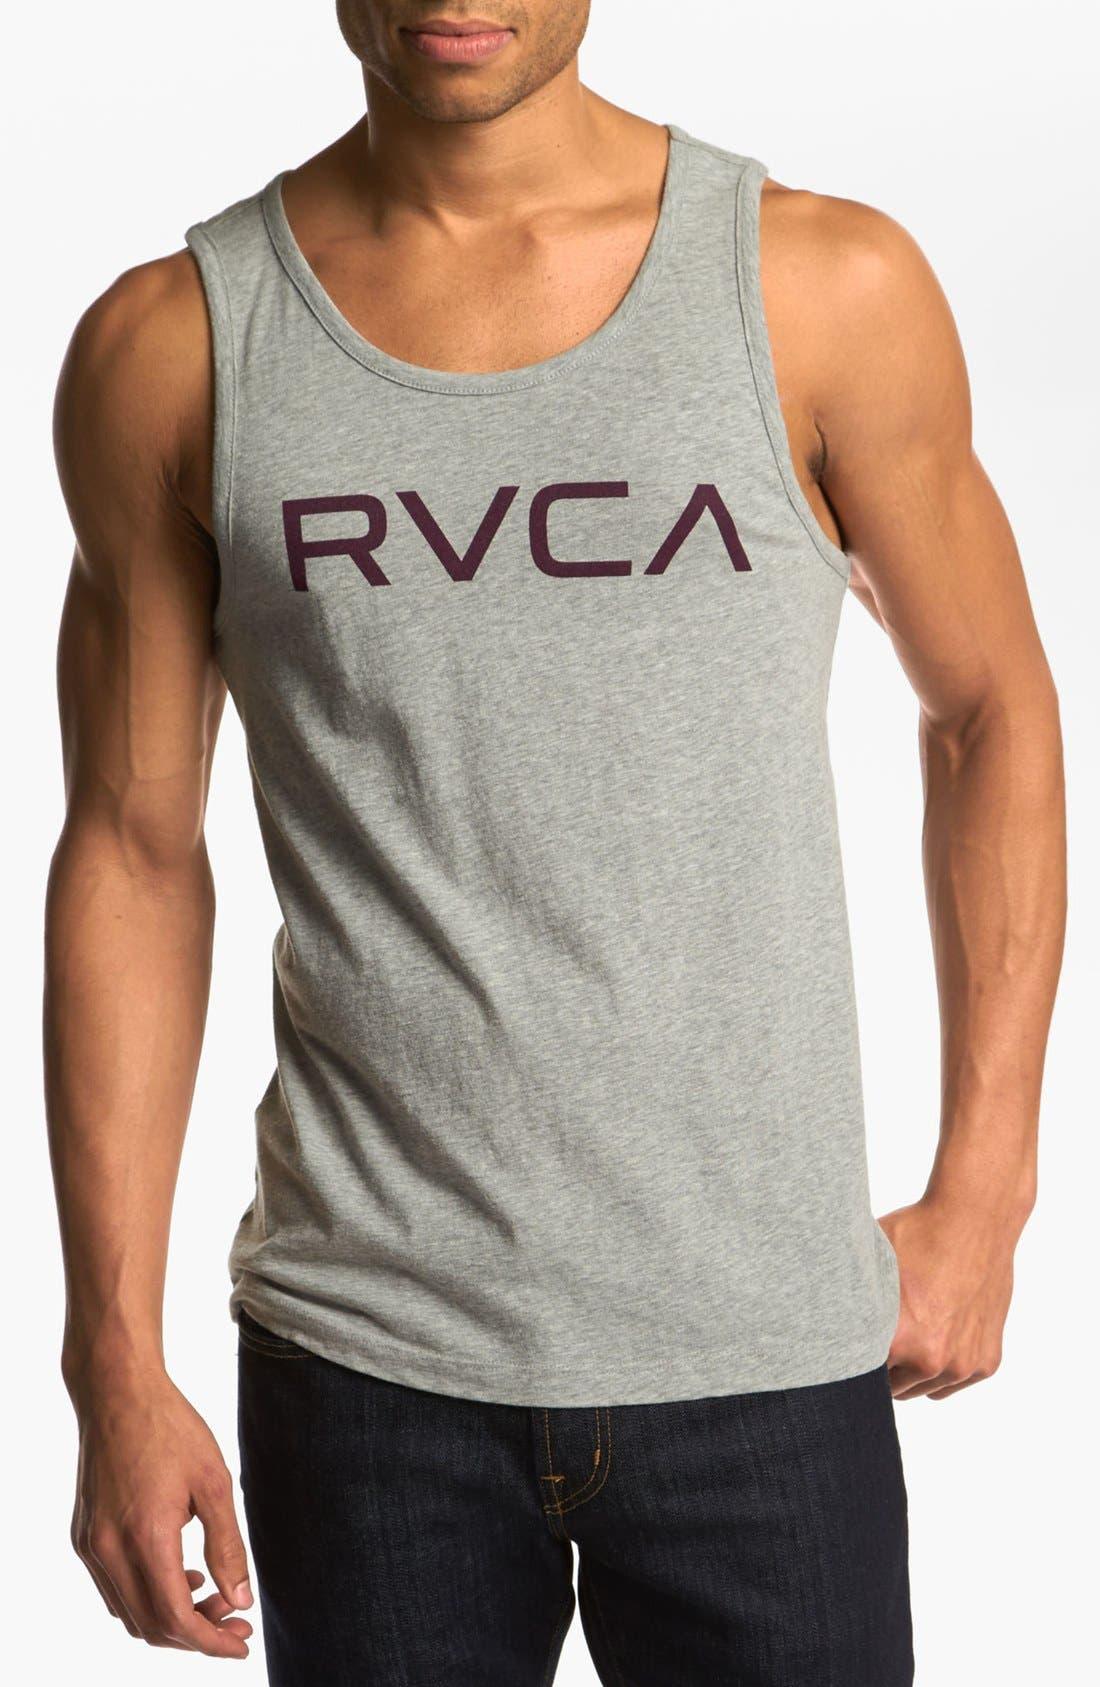 Main Image - RVCA 'Big' Tank Top